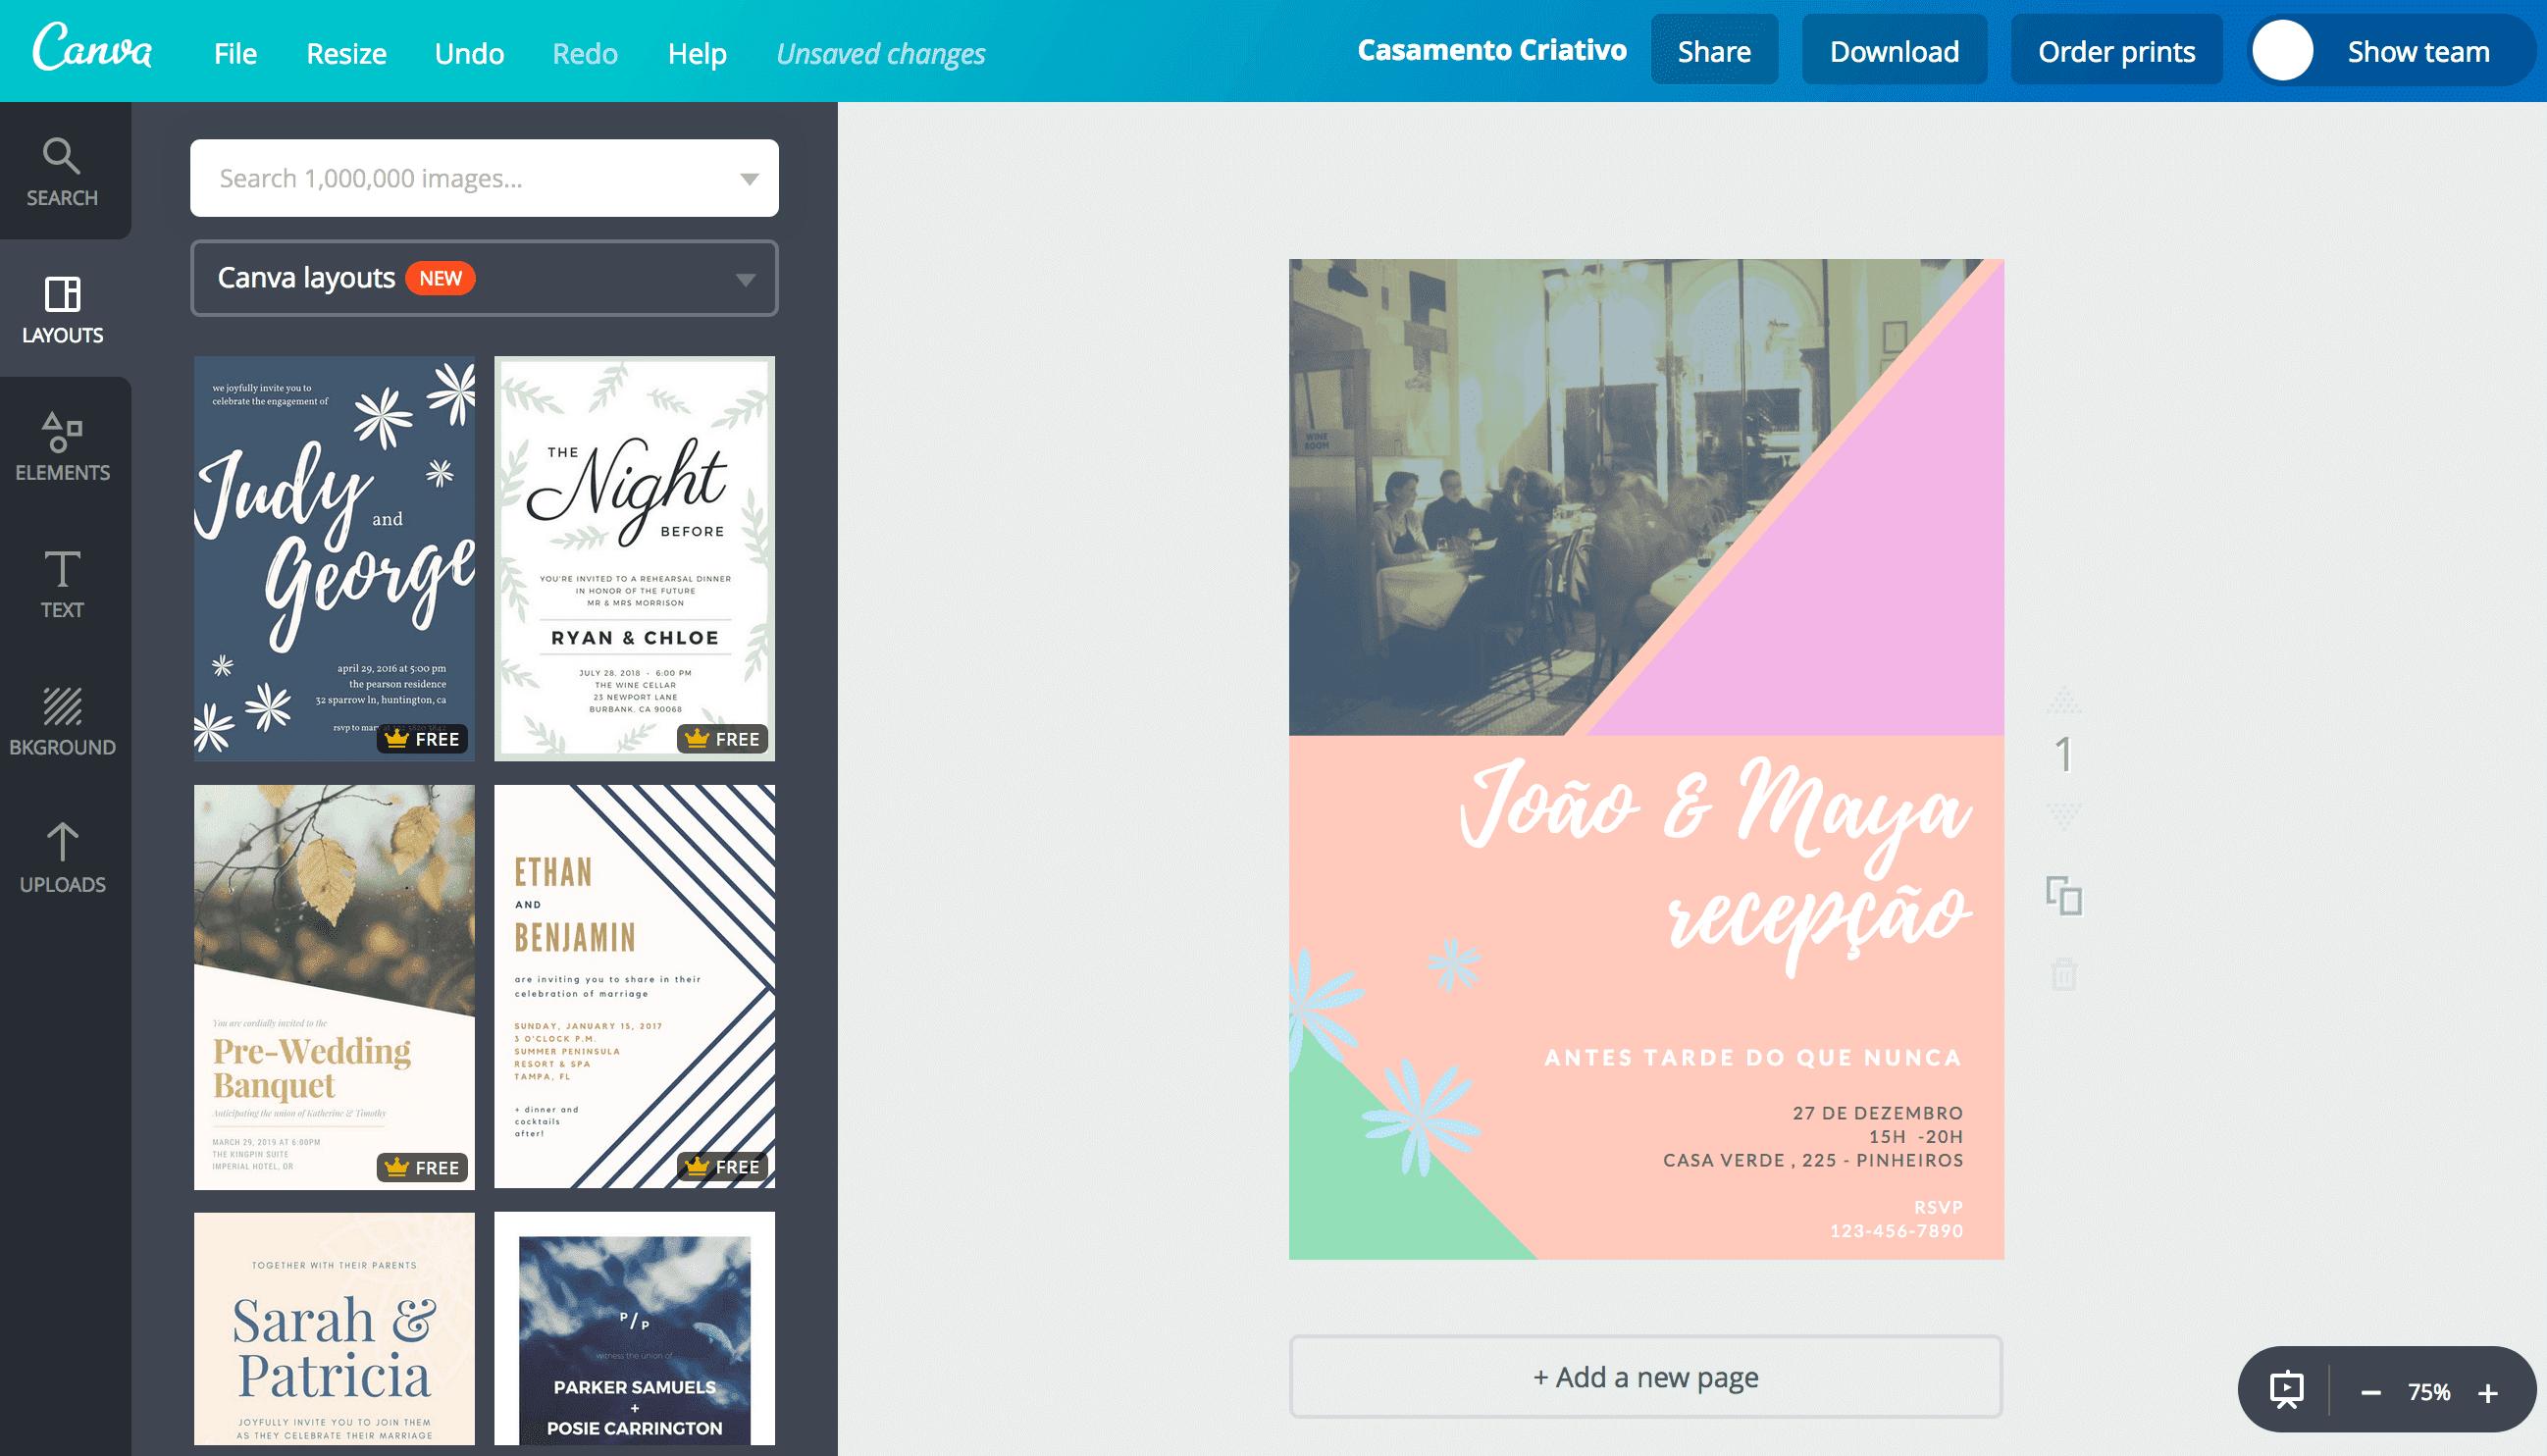 Convite de casamento criativos